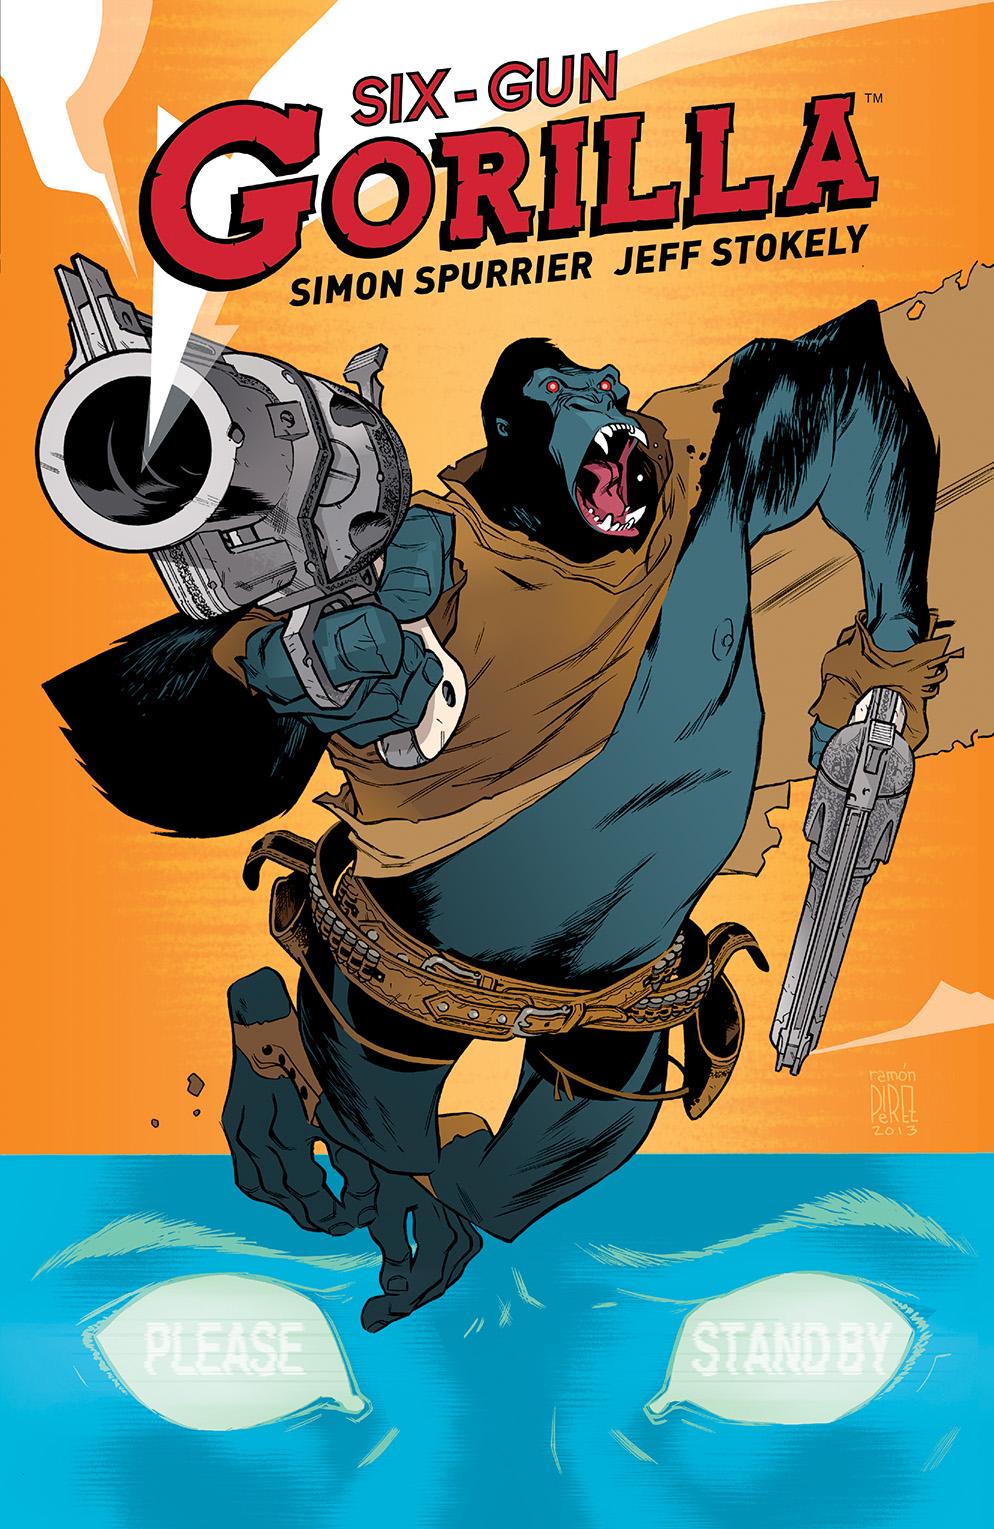 SIX-GUN GORILLA TP Cover by Ramón Pérez